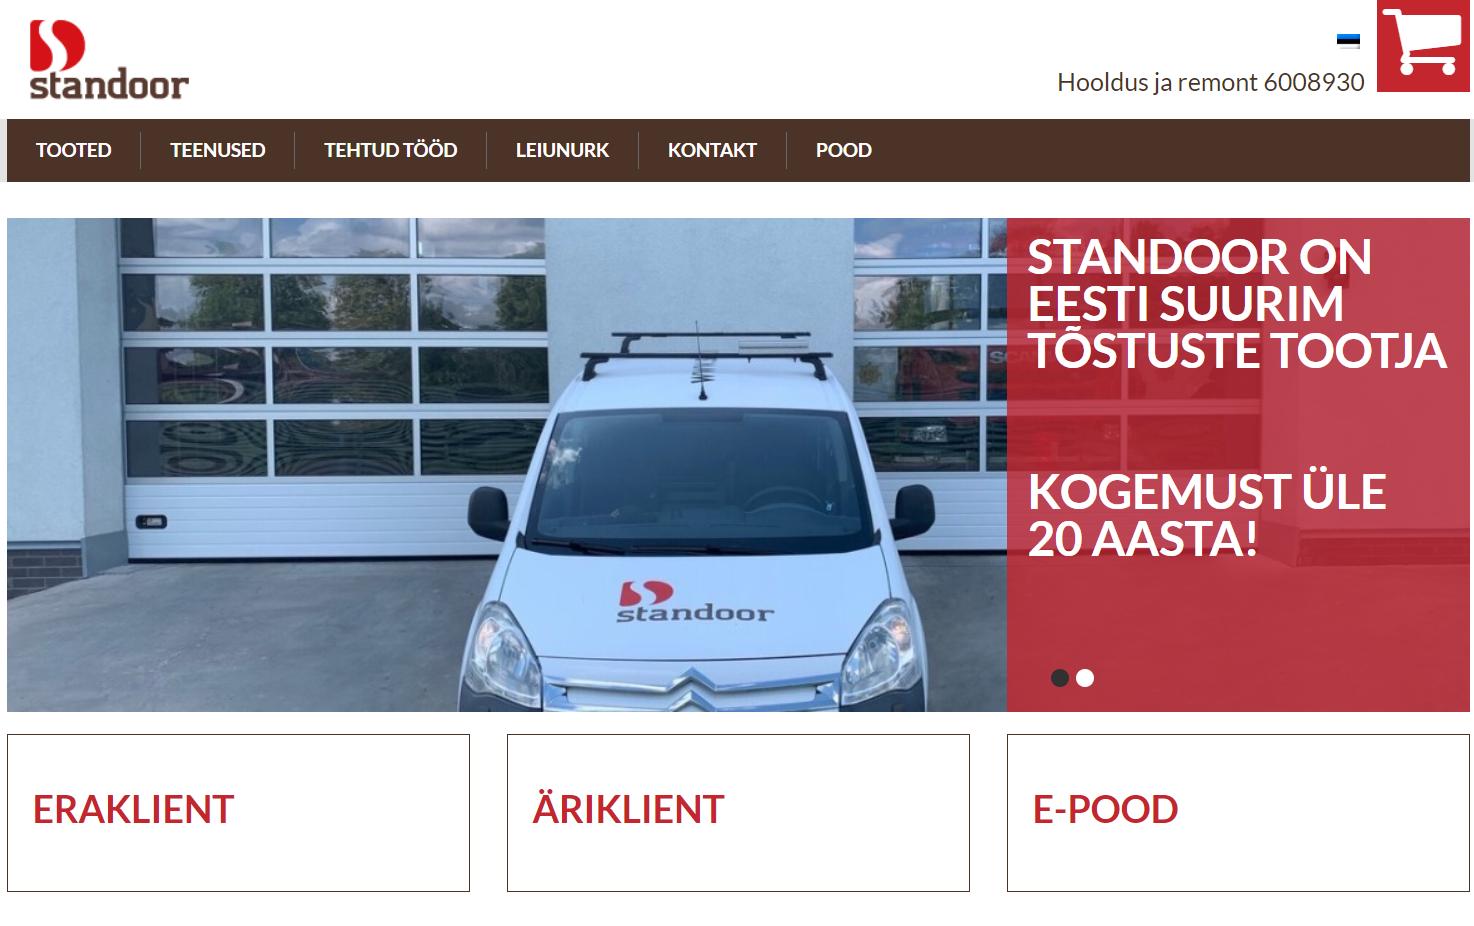 UUS koduleht- Standoor Eesti